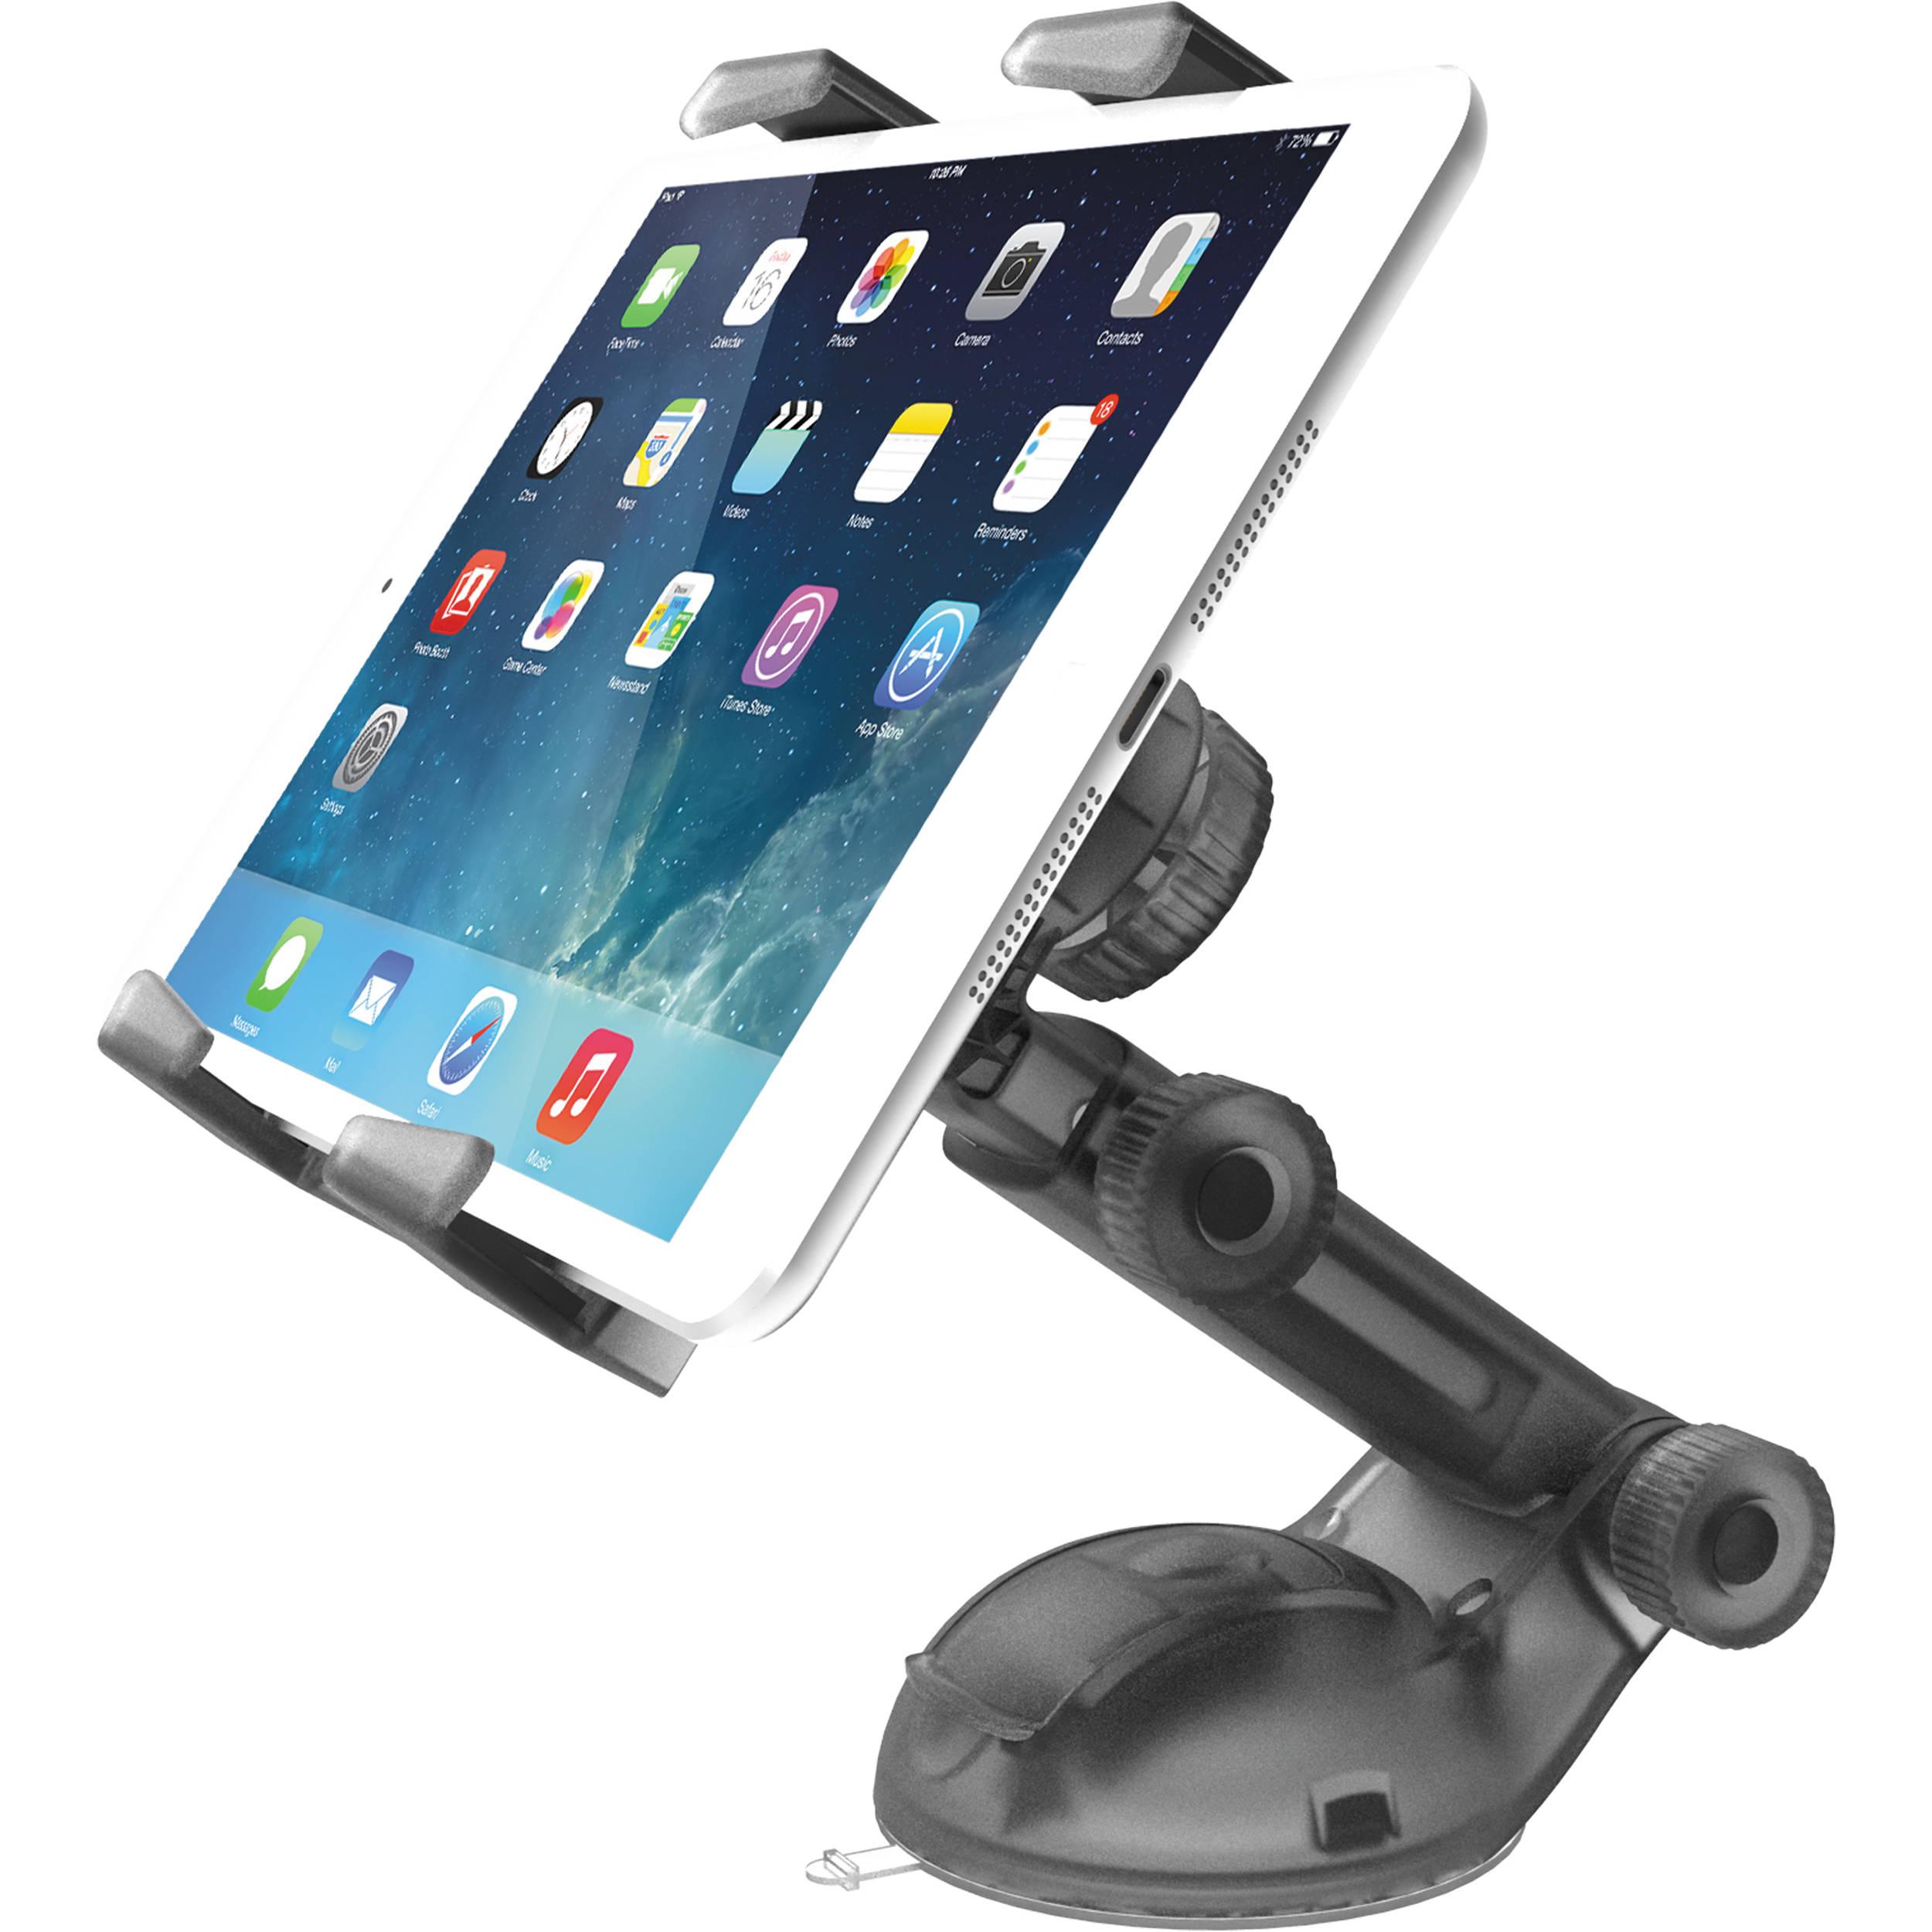 iOttie Easy Smart Tap 2 Universal Tablet Mount HLCRIO141 B&H